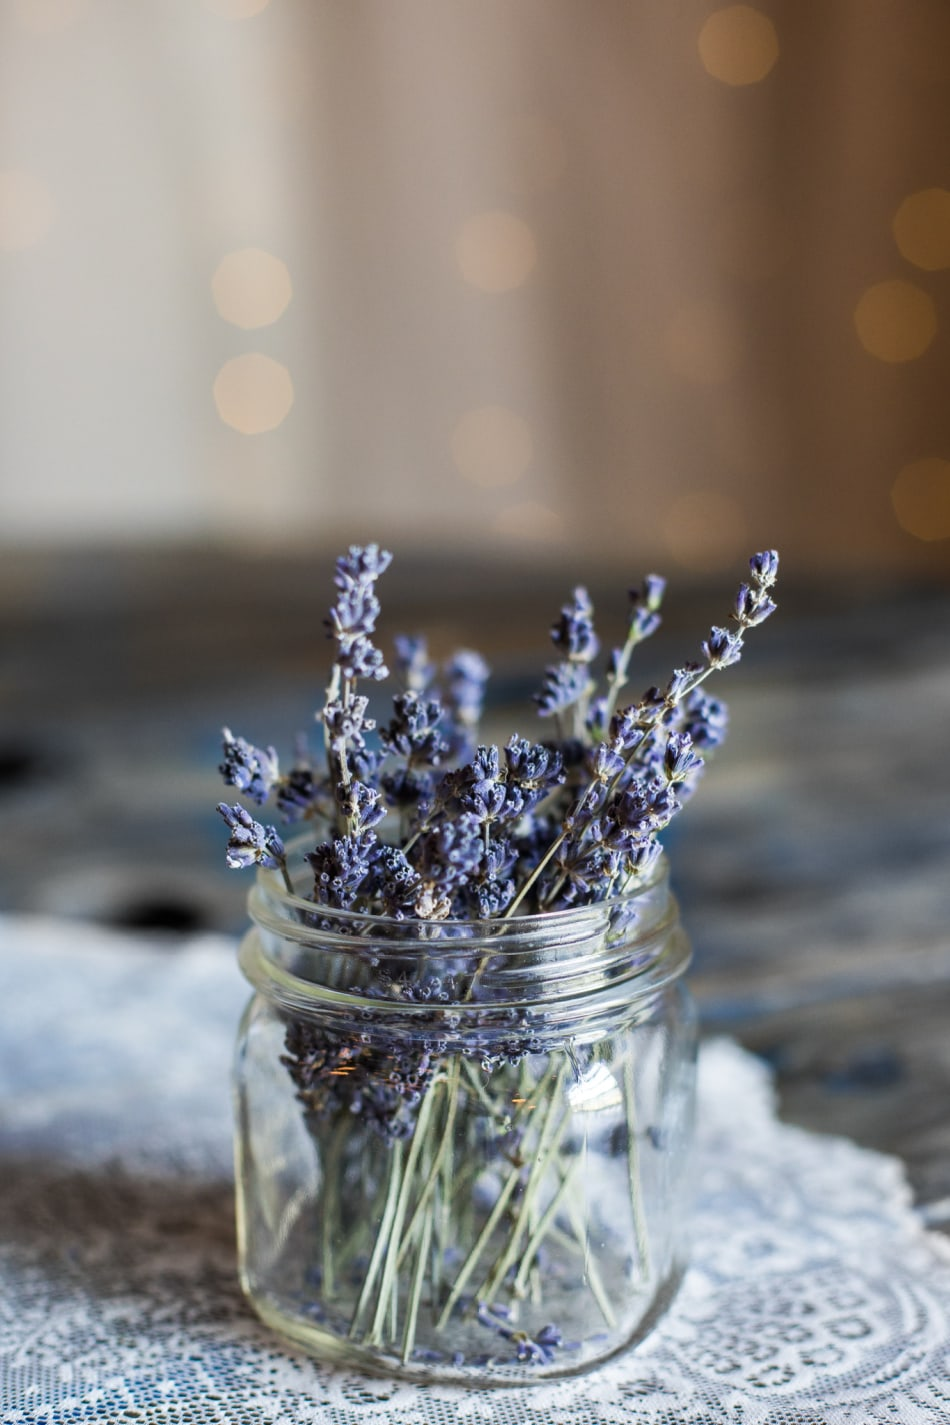 sprigs of lavender in jar